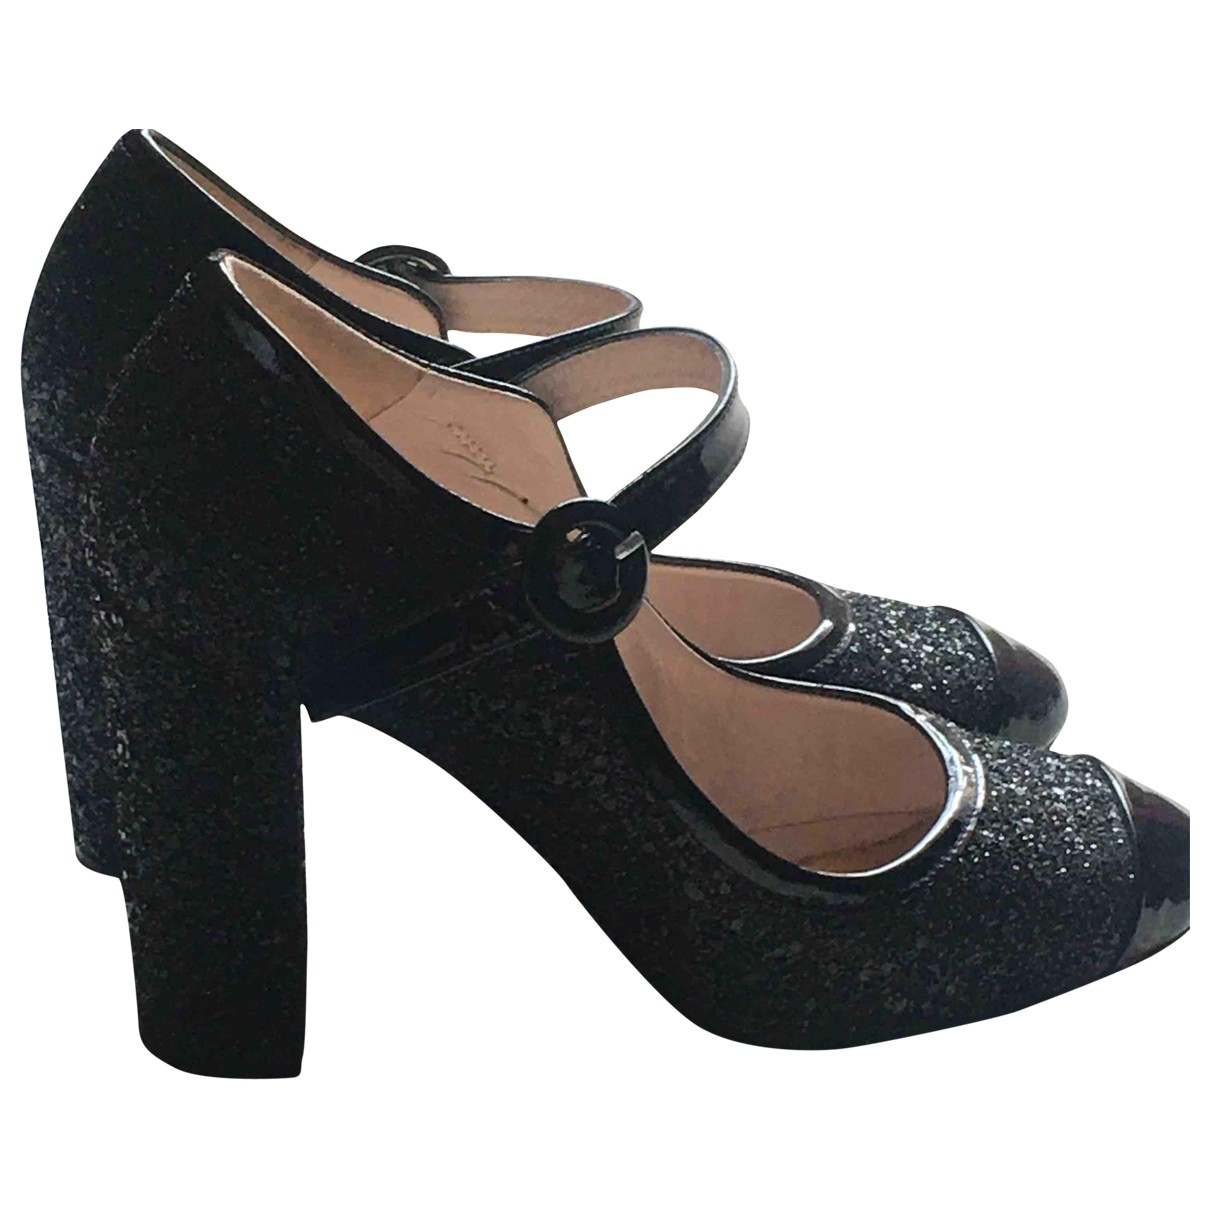 Lk Bennett \N Black Glitter Lace ups for Women 37 EU